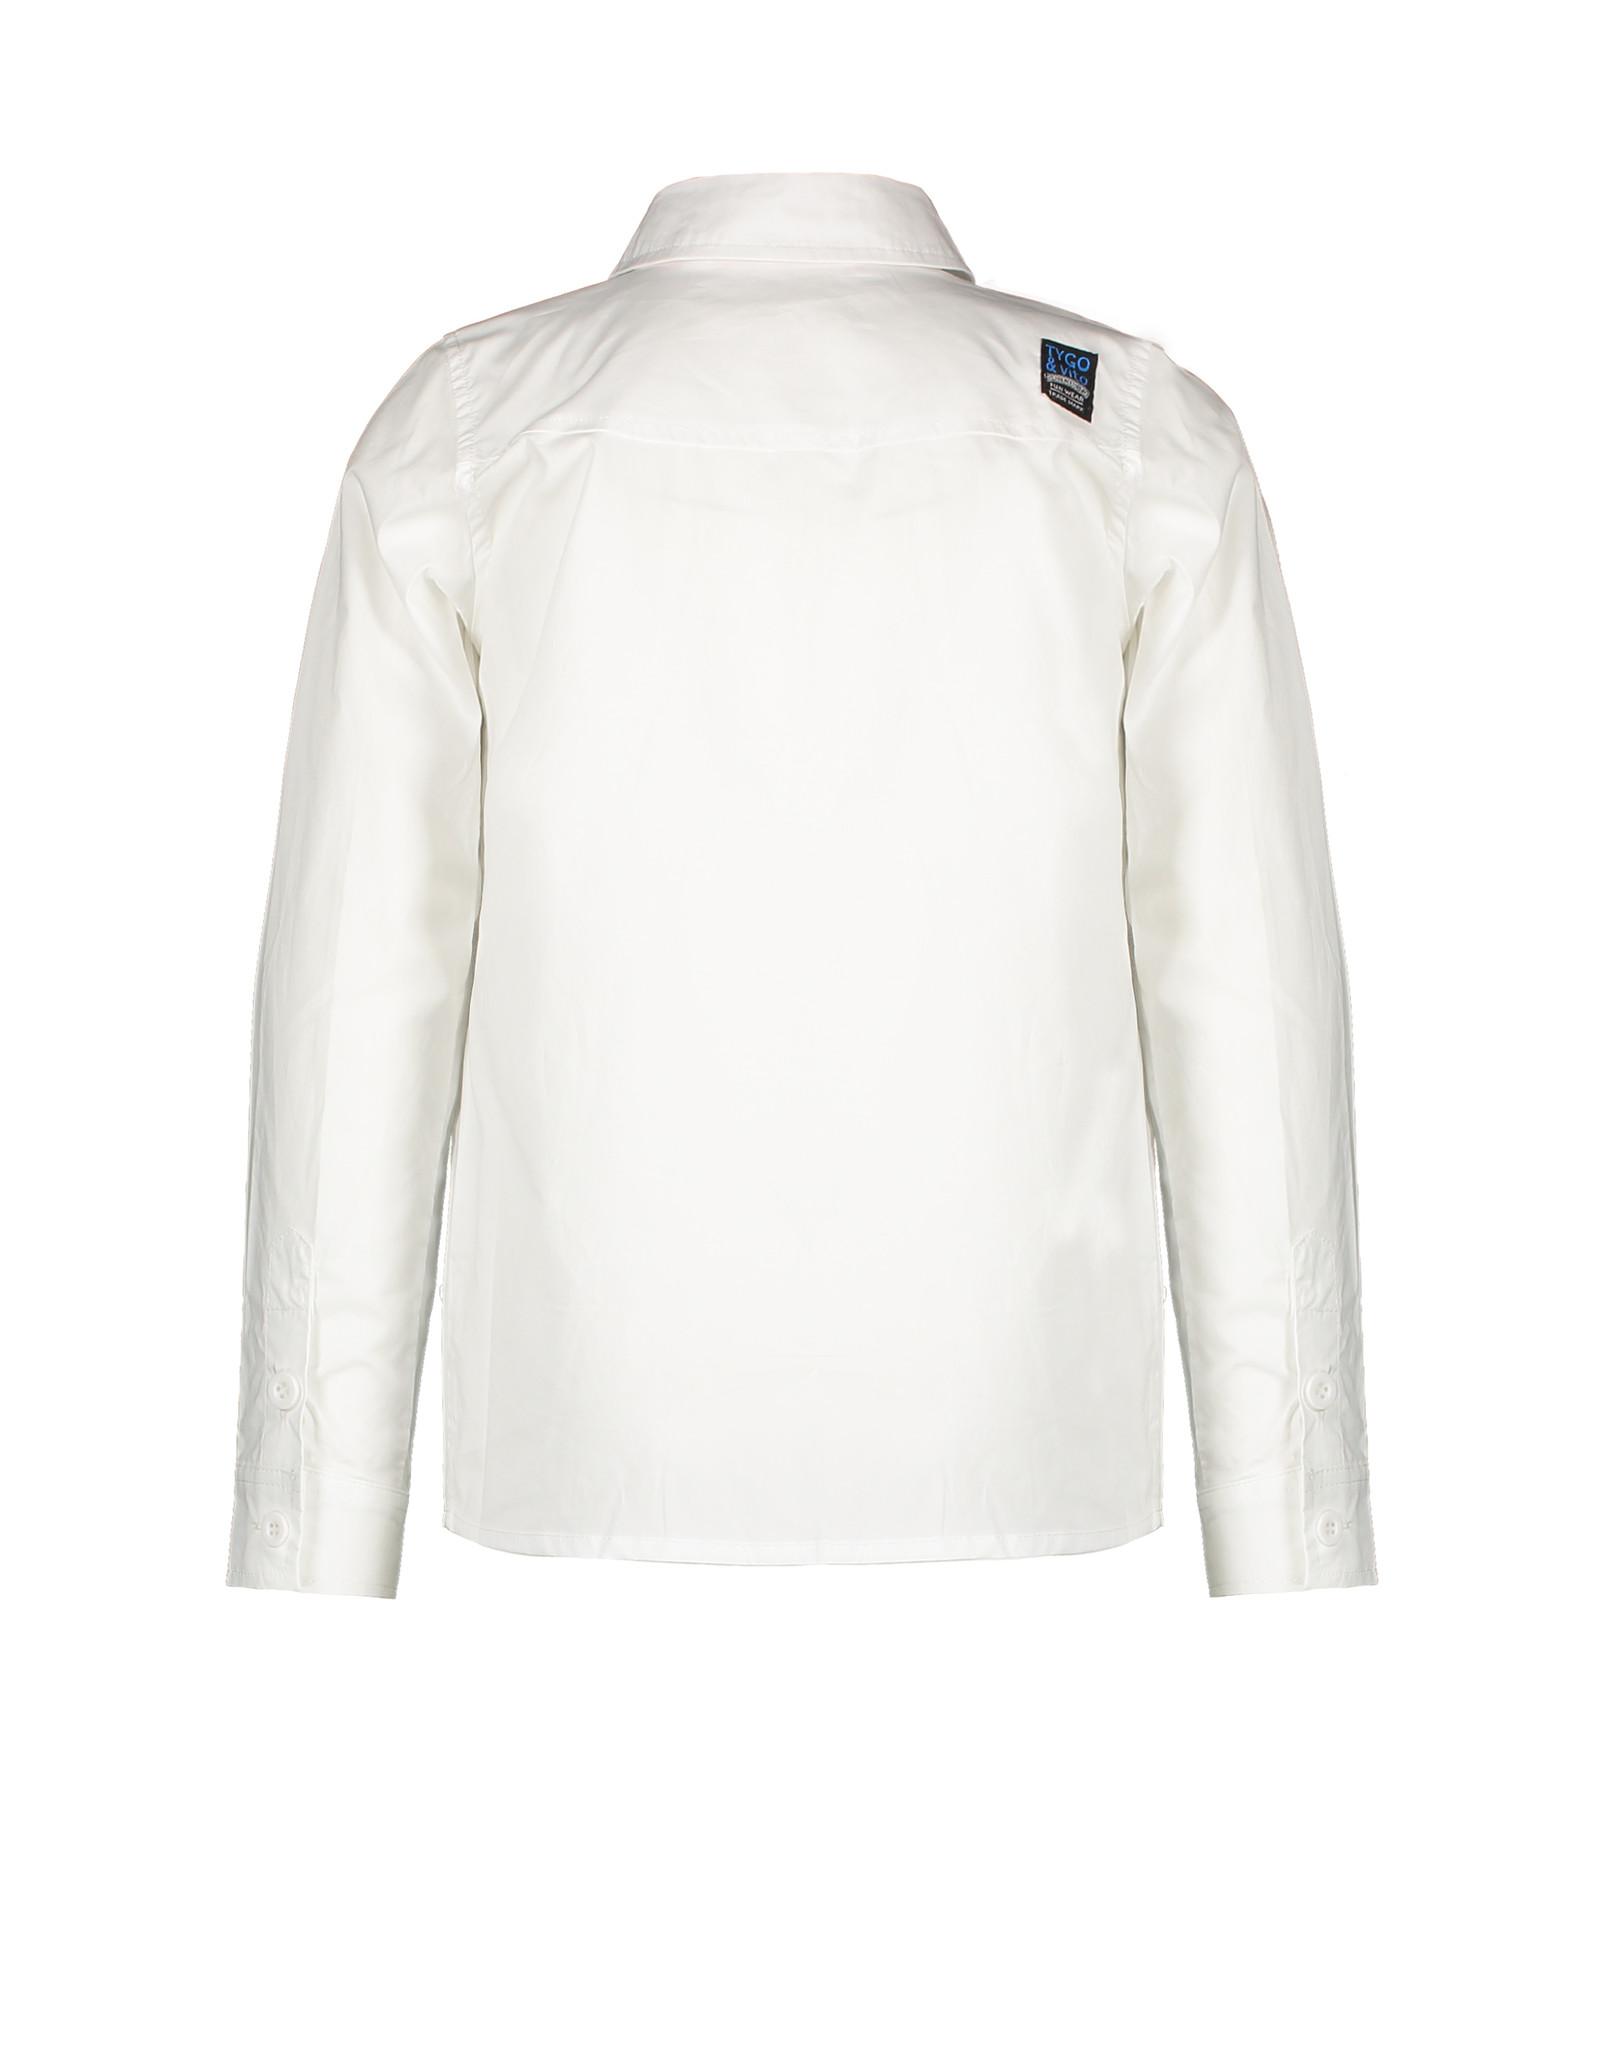 TYGO & Vito TYGO & Vito Shirt WHITE